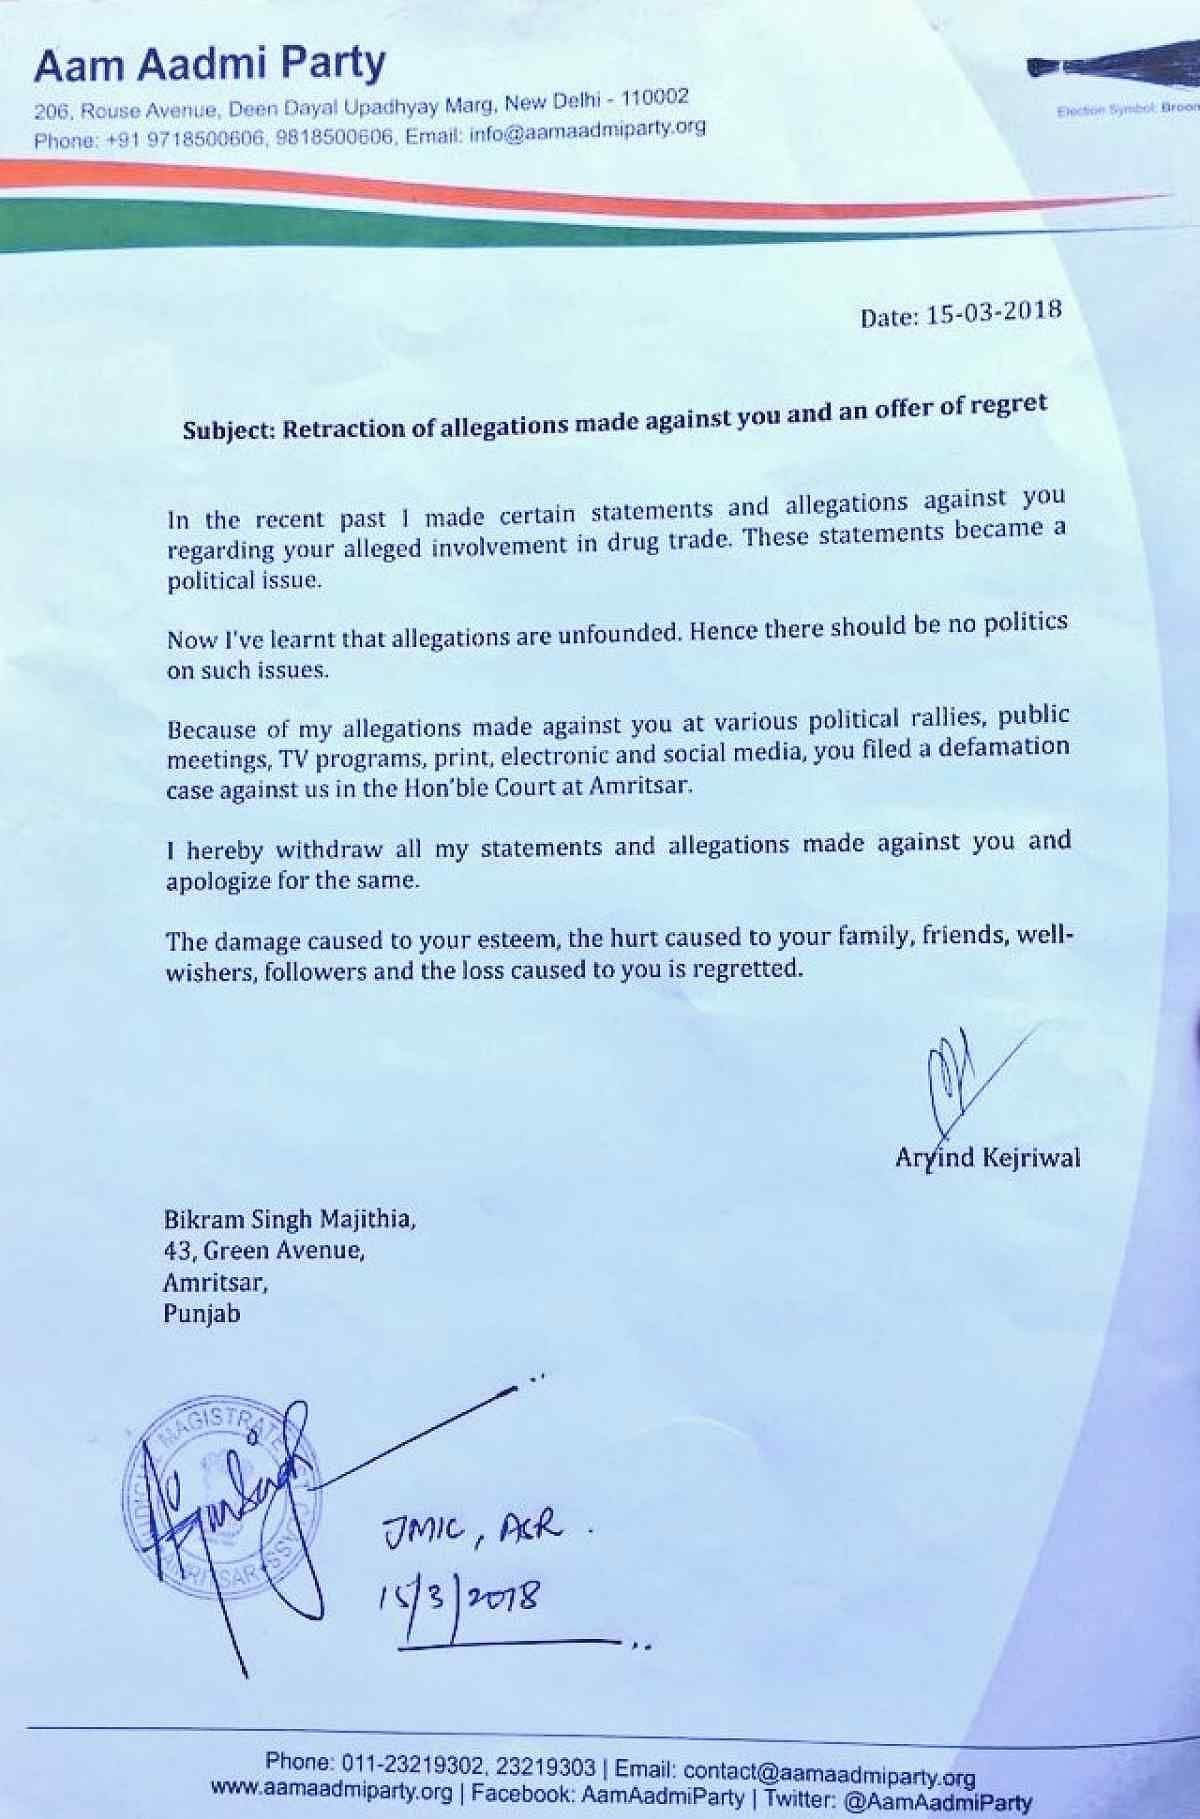 Arvind Kejriwal's apology letter to Bikram Singh Majithia